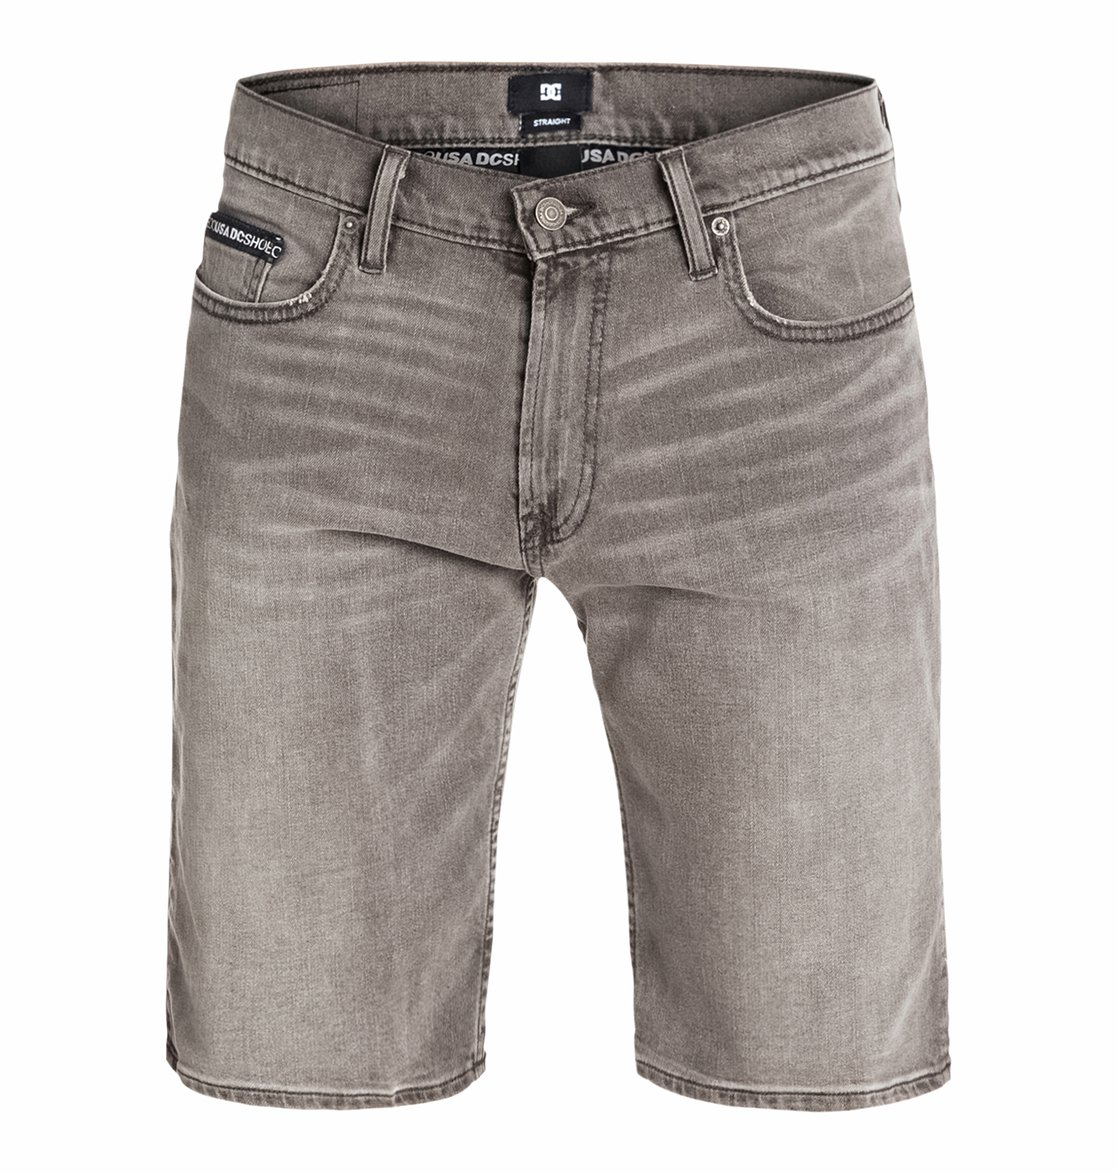 Worker Straight Denim Shorts Grey stone - Dcshoes������� ������ ����� Wkr Straight Dnm Shorts Grst �� DC Shoes � ������� �� ��������� ����� 2015. ��������������: ������� �� ������, ������������� ������, ������� � ������� DC.<br>